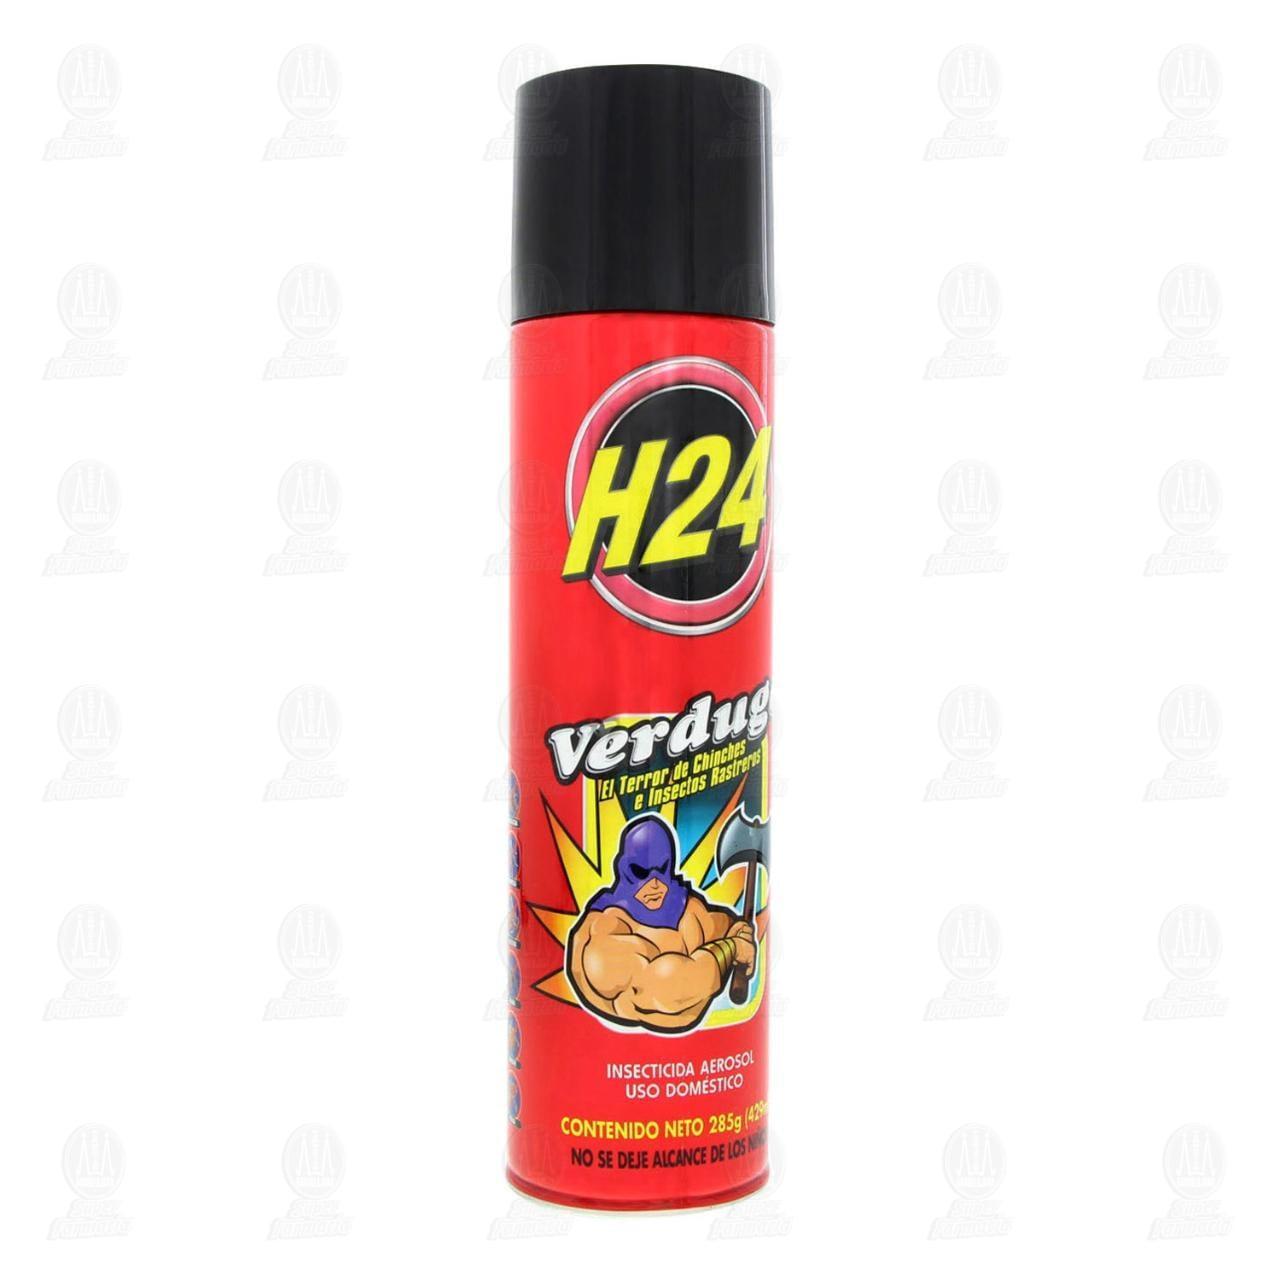 Insecticida H24 Verdugo en Aerosol Uso Doméstico, 429 ml.